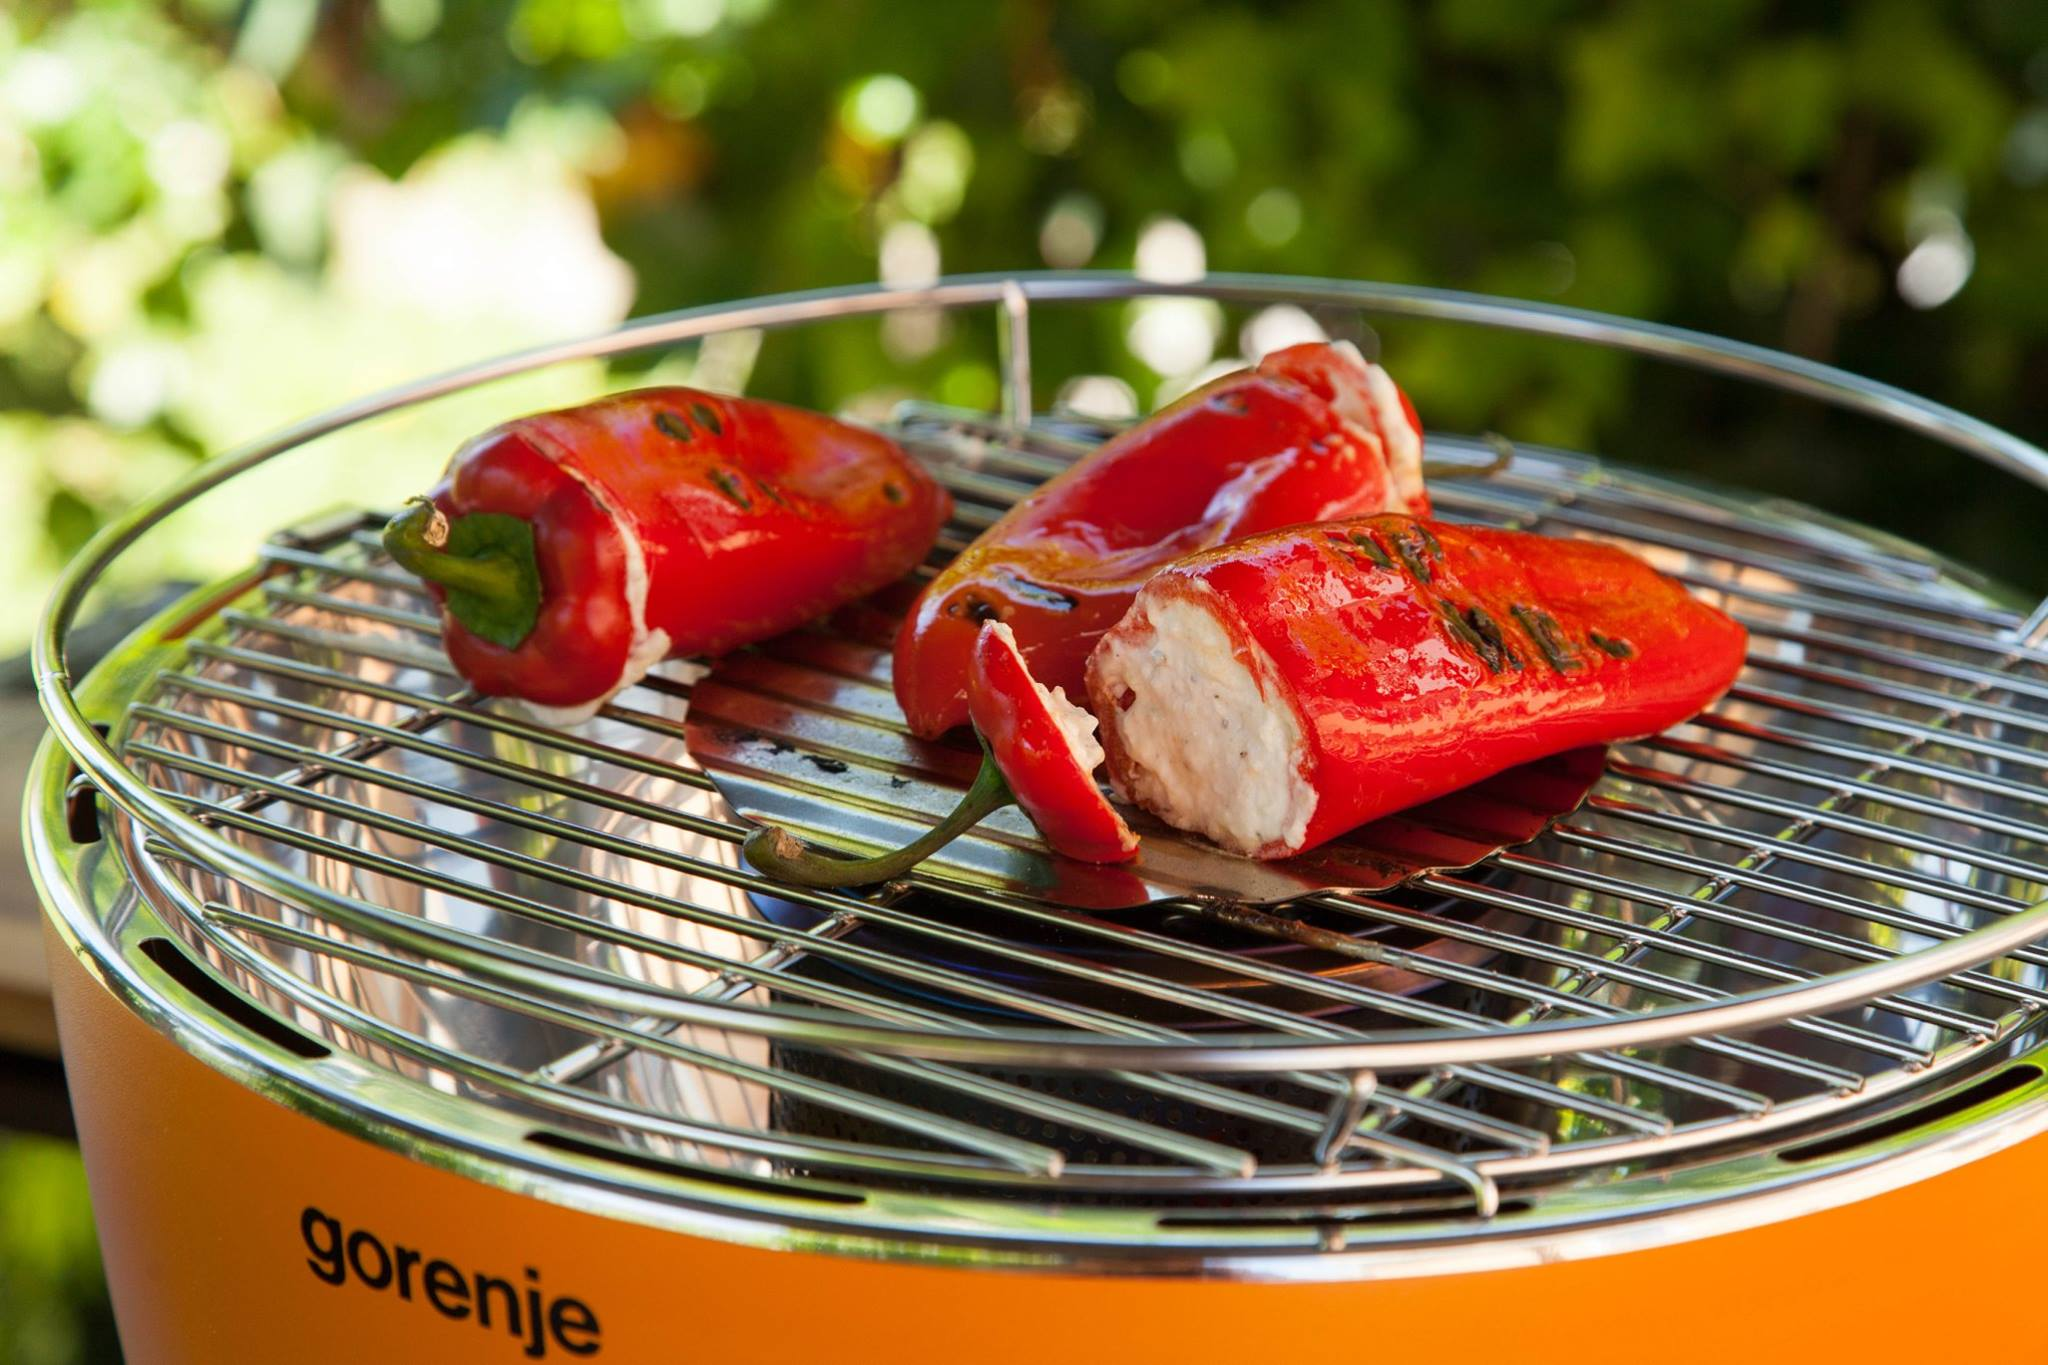 Polnjena paprika z rikoto na žaru